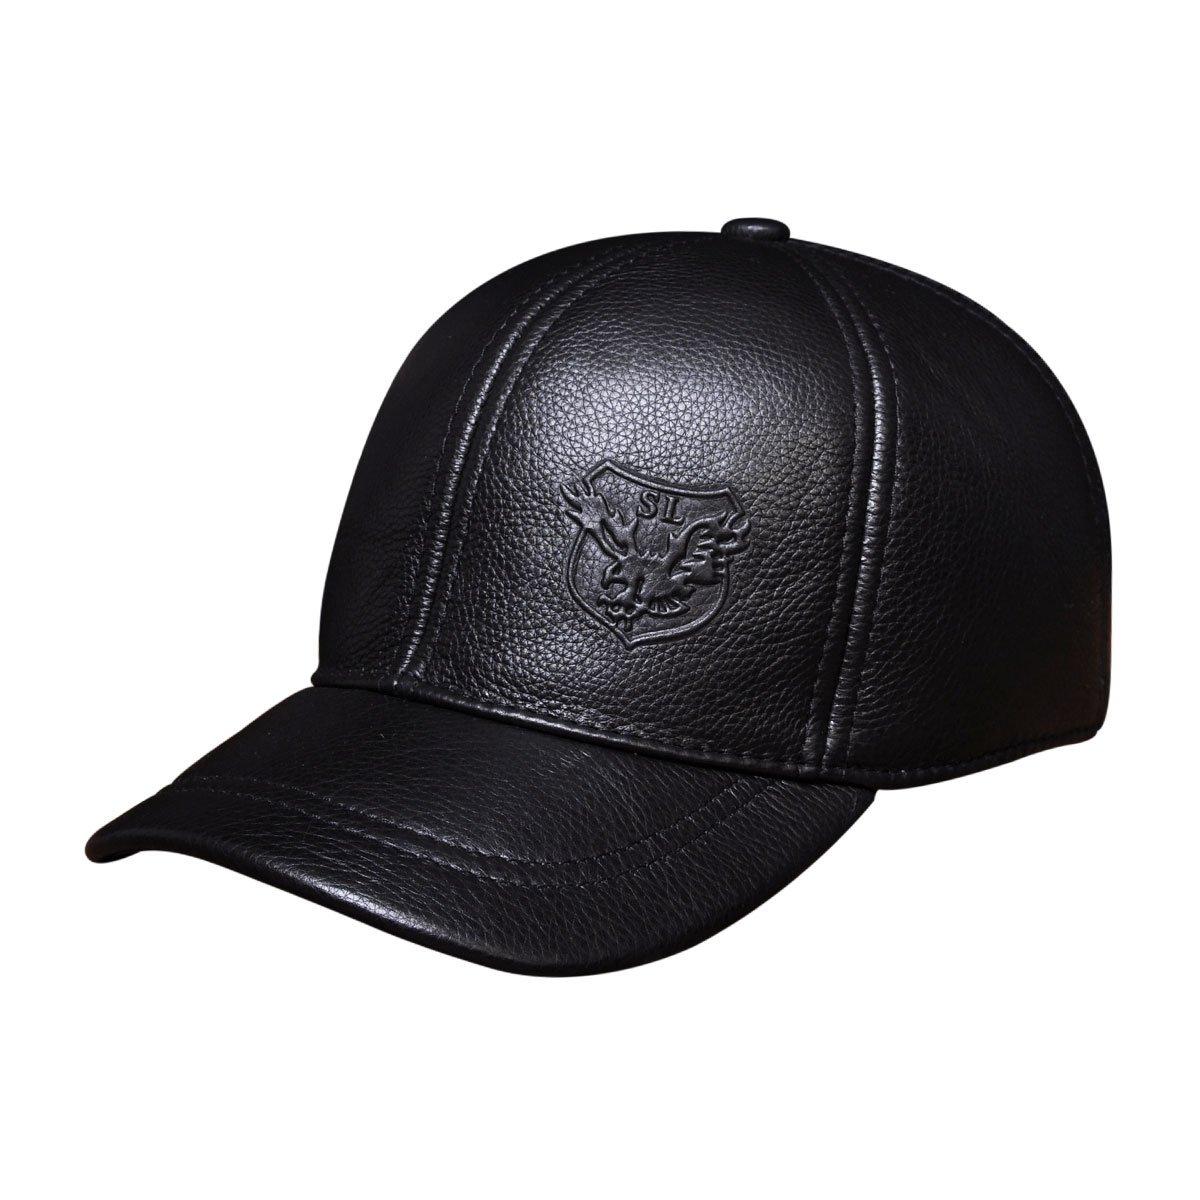 9e78ad9ab3585d Haisum Men's Baseball Cap Vintage Adjustable Suede Leather Hats with  Snapback: Amazon.co.uk: Clothing